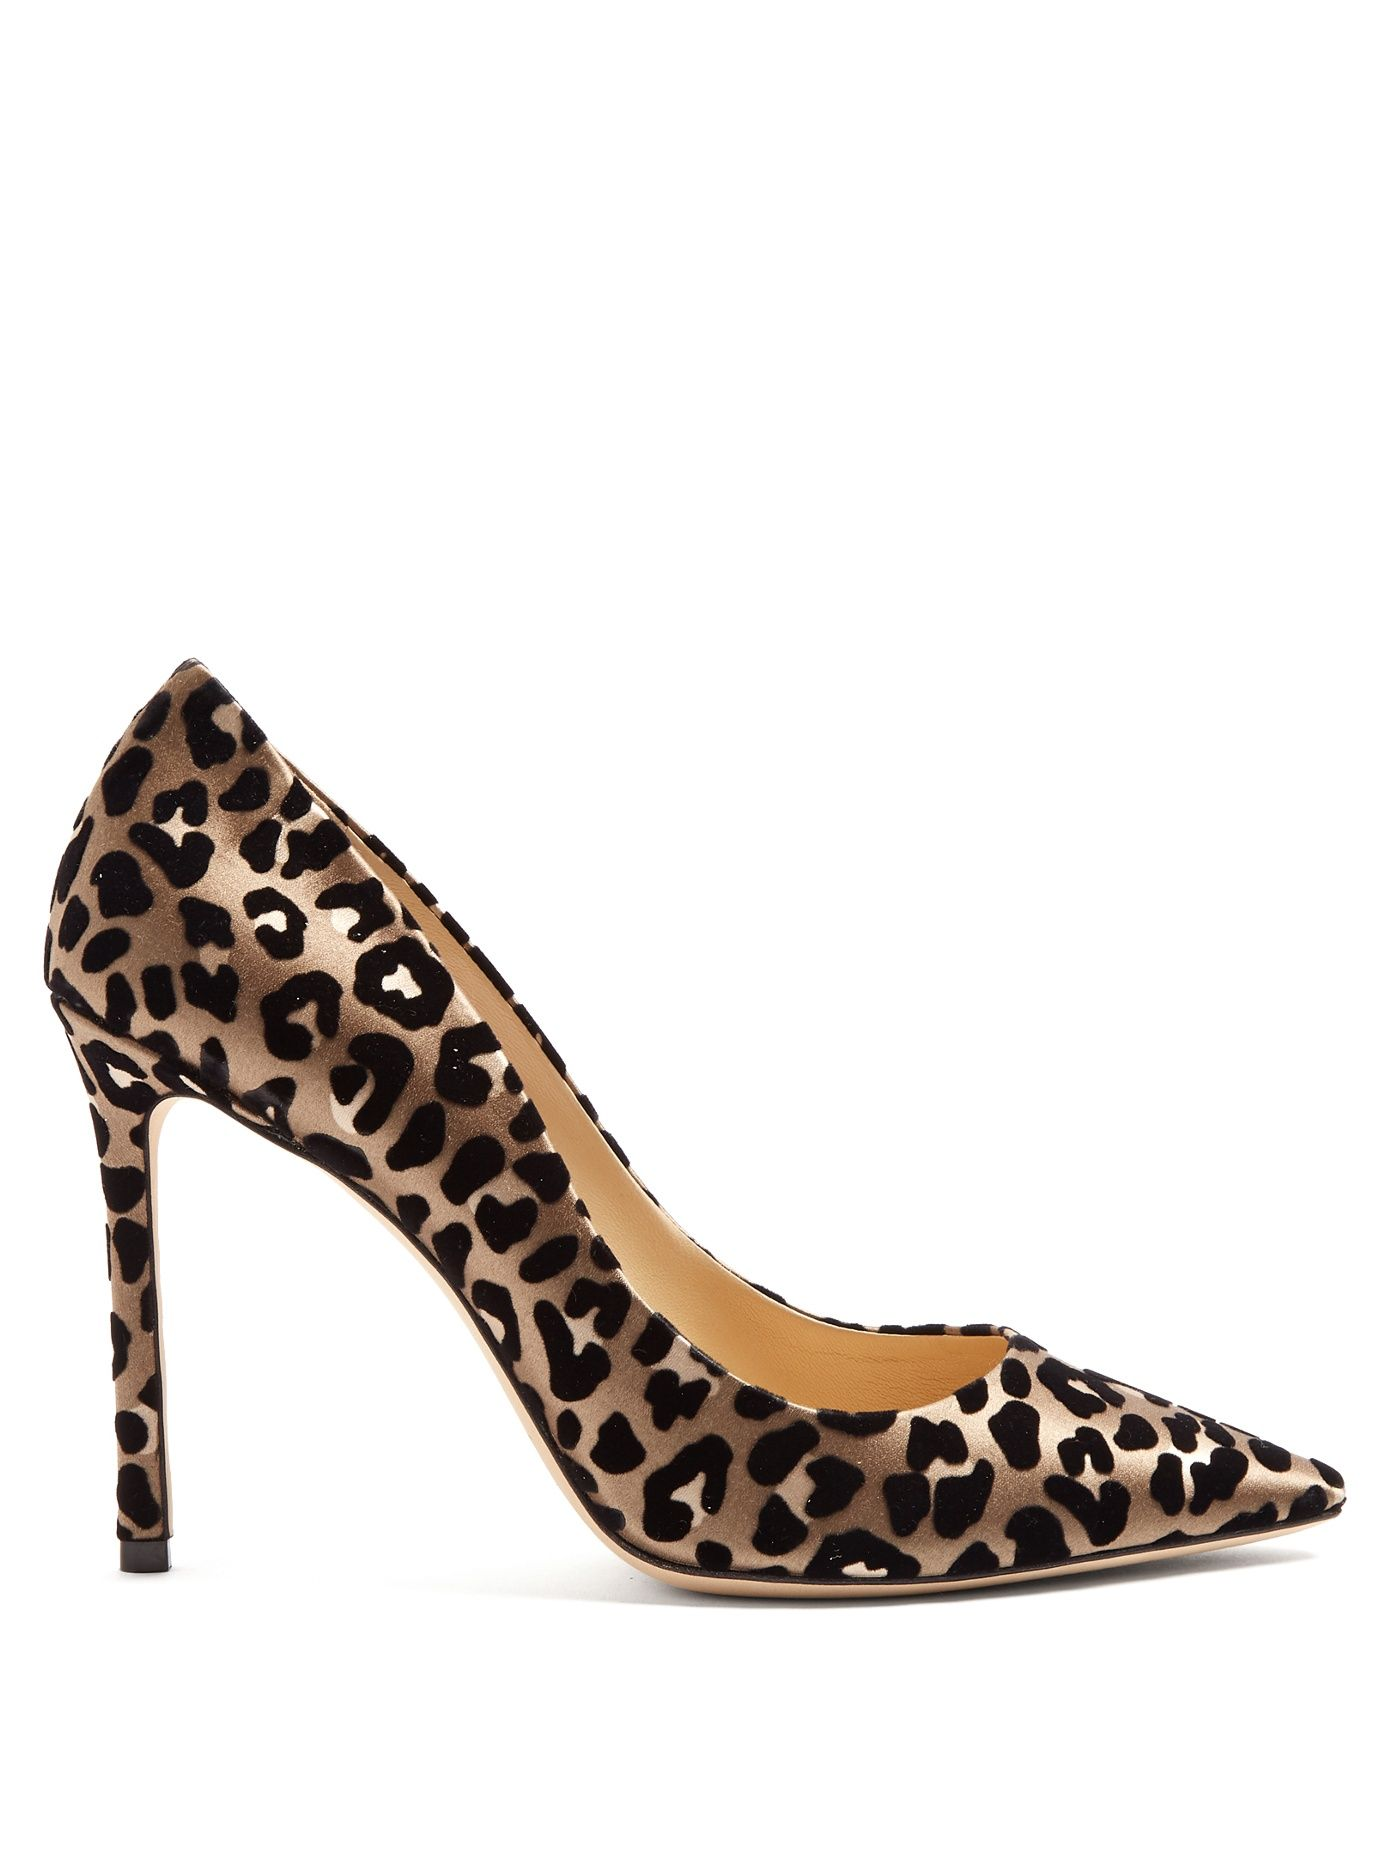 5122d8fa5d01 Romy 100mm leopard-print velvet heels | Jimmy Choo | MATCHESFASHION.COM US